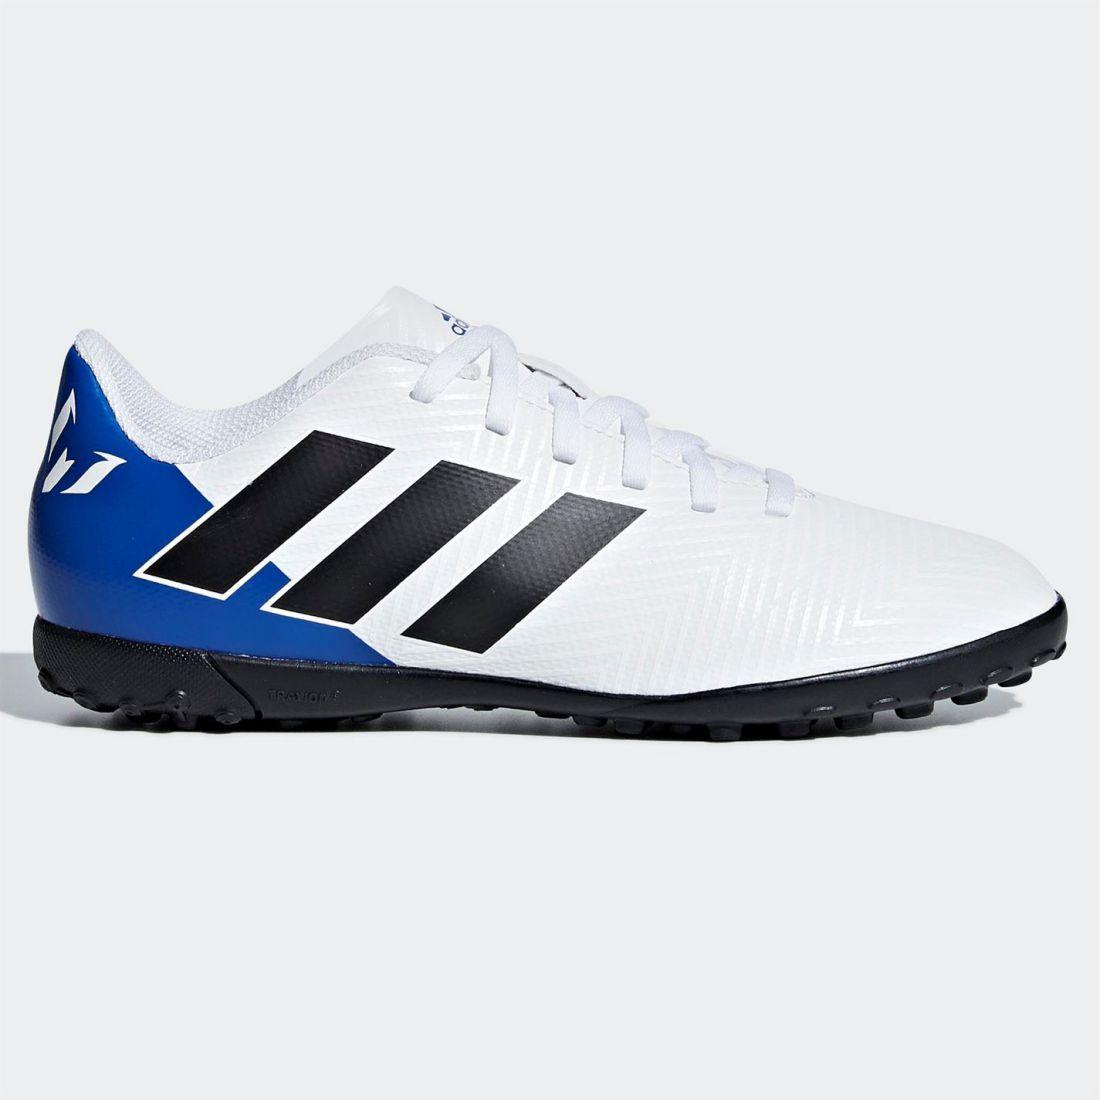 2f5b8ca3f1b2 adidas Nemeziz Messi Tango 18.4 Childrens Astro Turf Sneakers ...